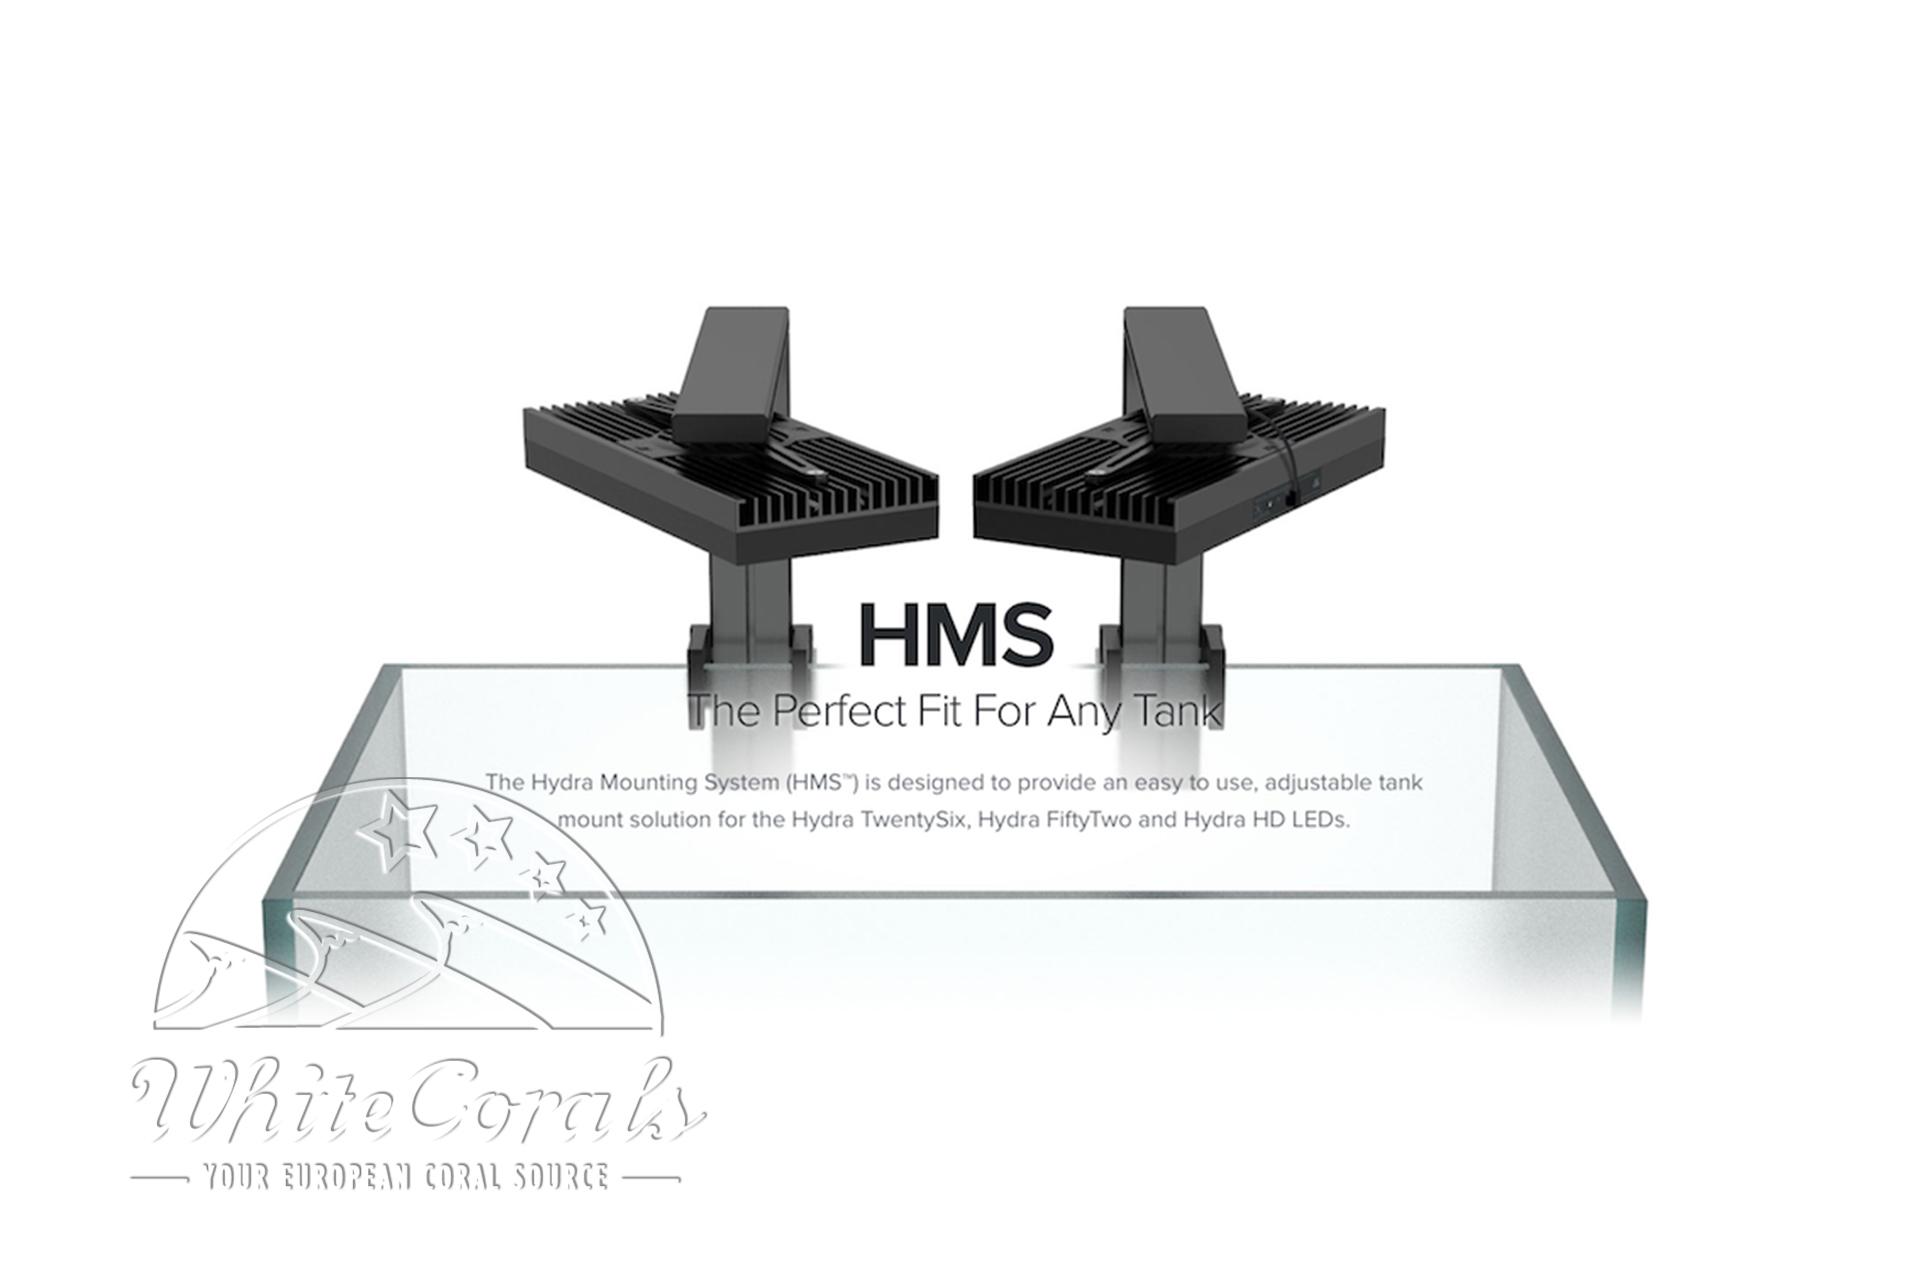 AI HMS single arm assembly for Hydra 26/52